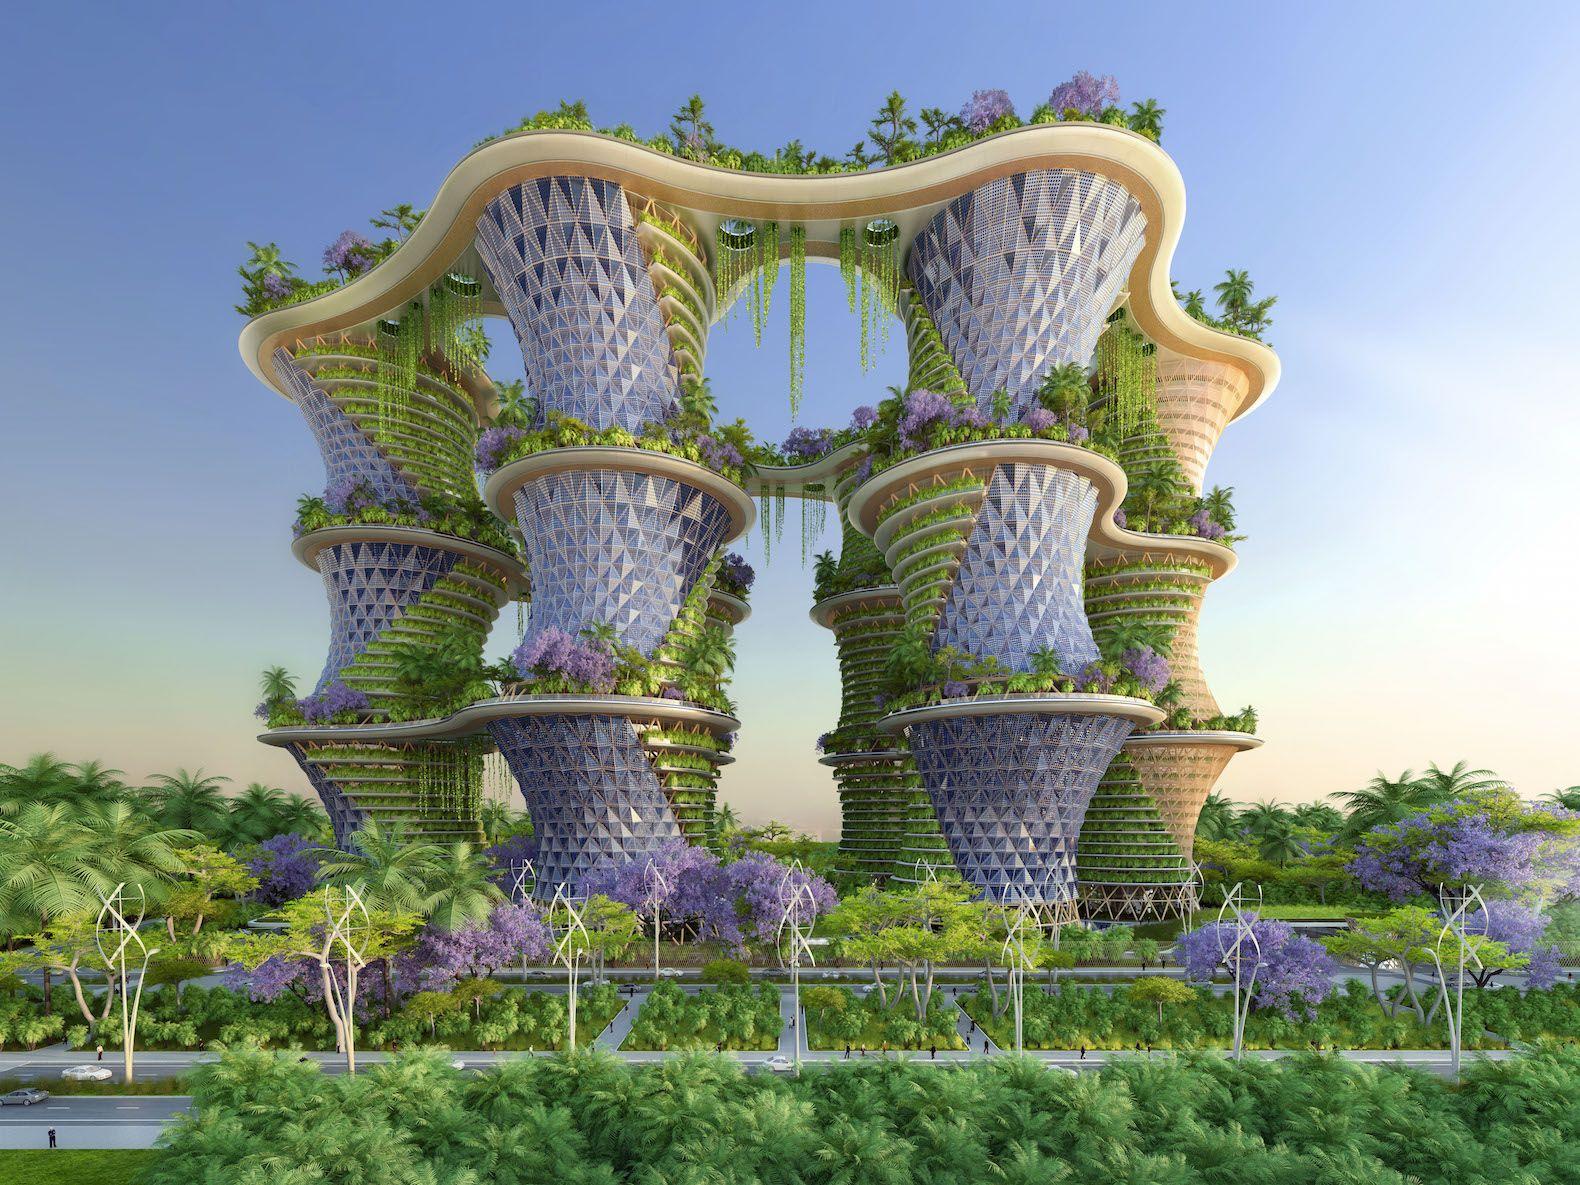 Urban farming utopia in India produces more energy than it